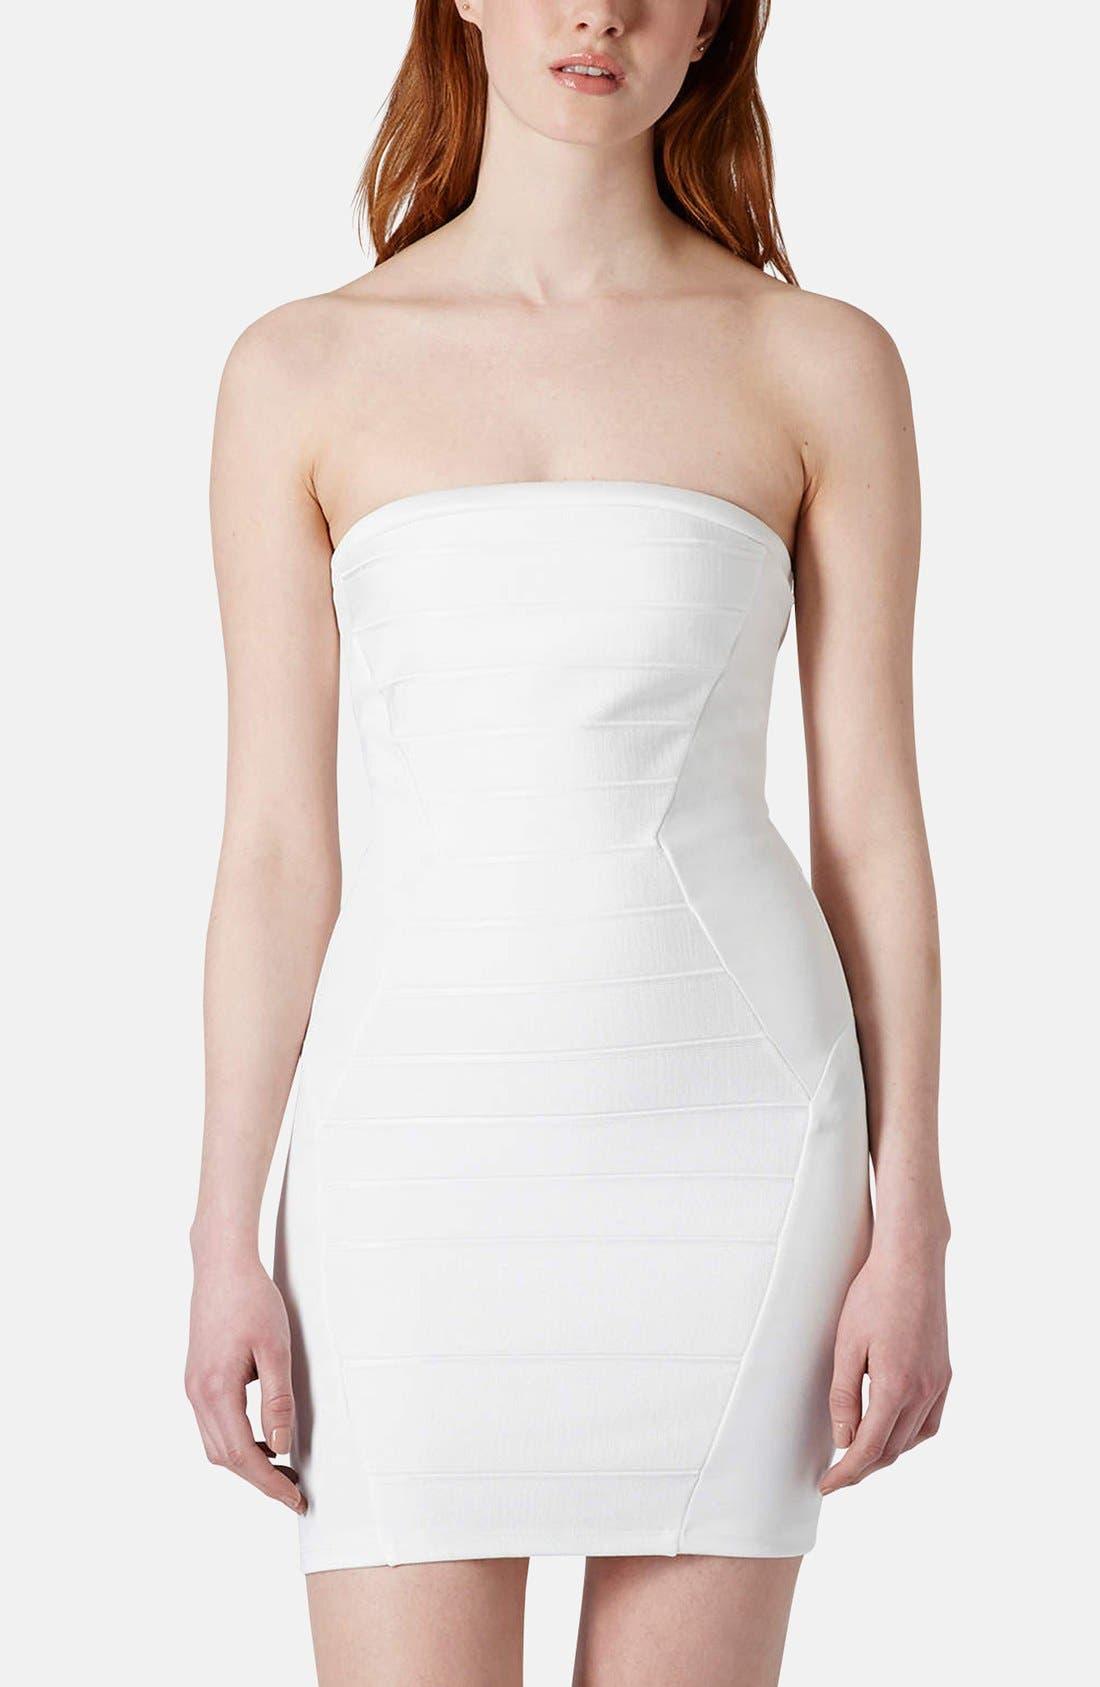 Alternate Image 1 Selected - Topshop Strapless Satin Body-Con Dress (Petite)